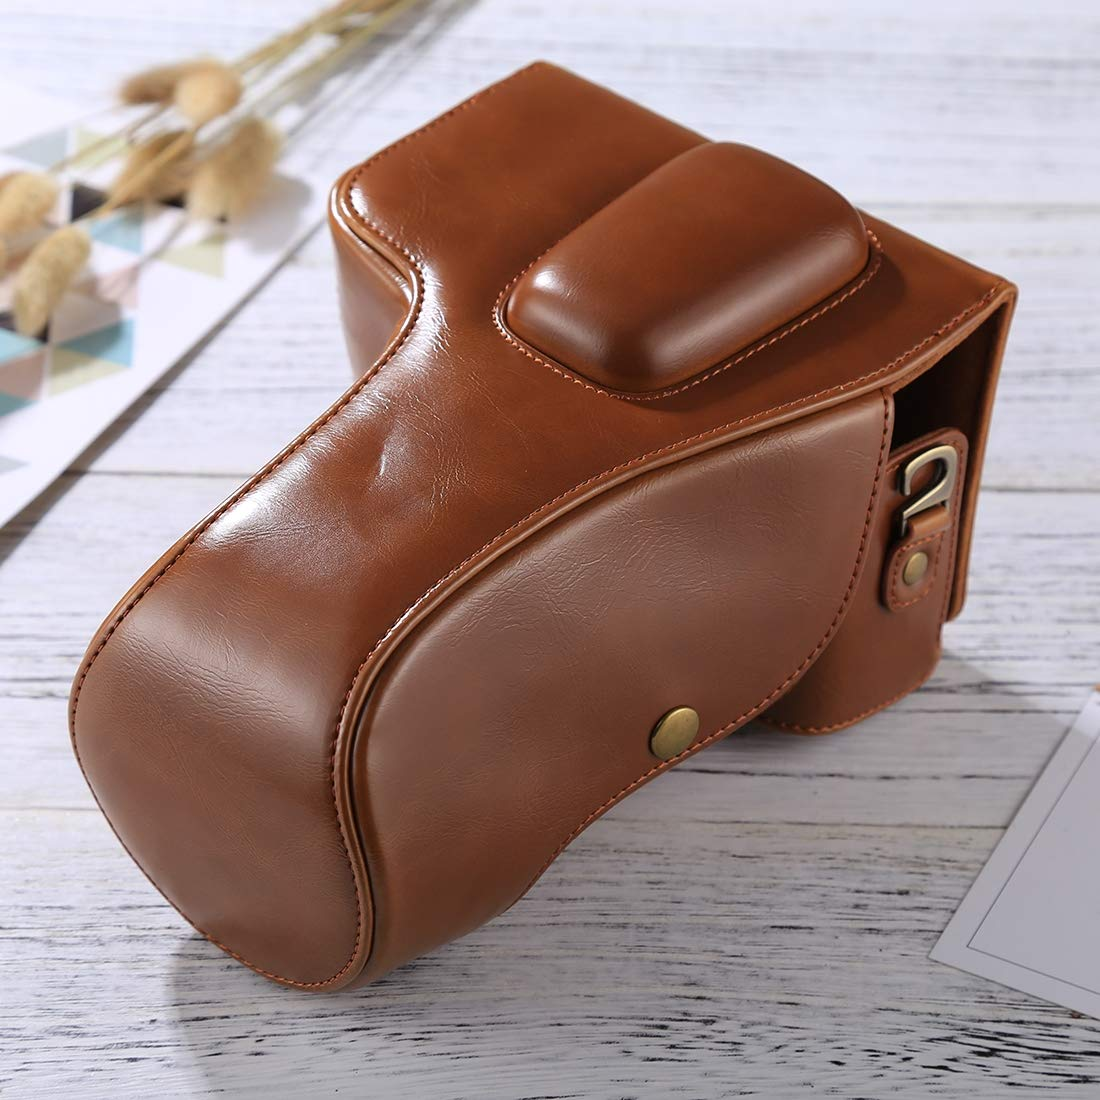 Anstorematealliance Bag,case&Straps Nikon D5300 / D5200 / D5100用GuoBomate勝利バッグ、ケース、ストラップフルボディカメラPUレザーケースバッグ(18-55mm / 18-105mm / 18-140mmレンズ)(ブラック) (Color : Brown) B07RPFNQ3L